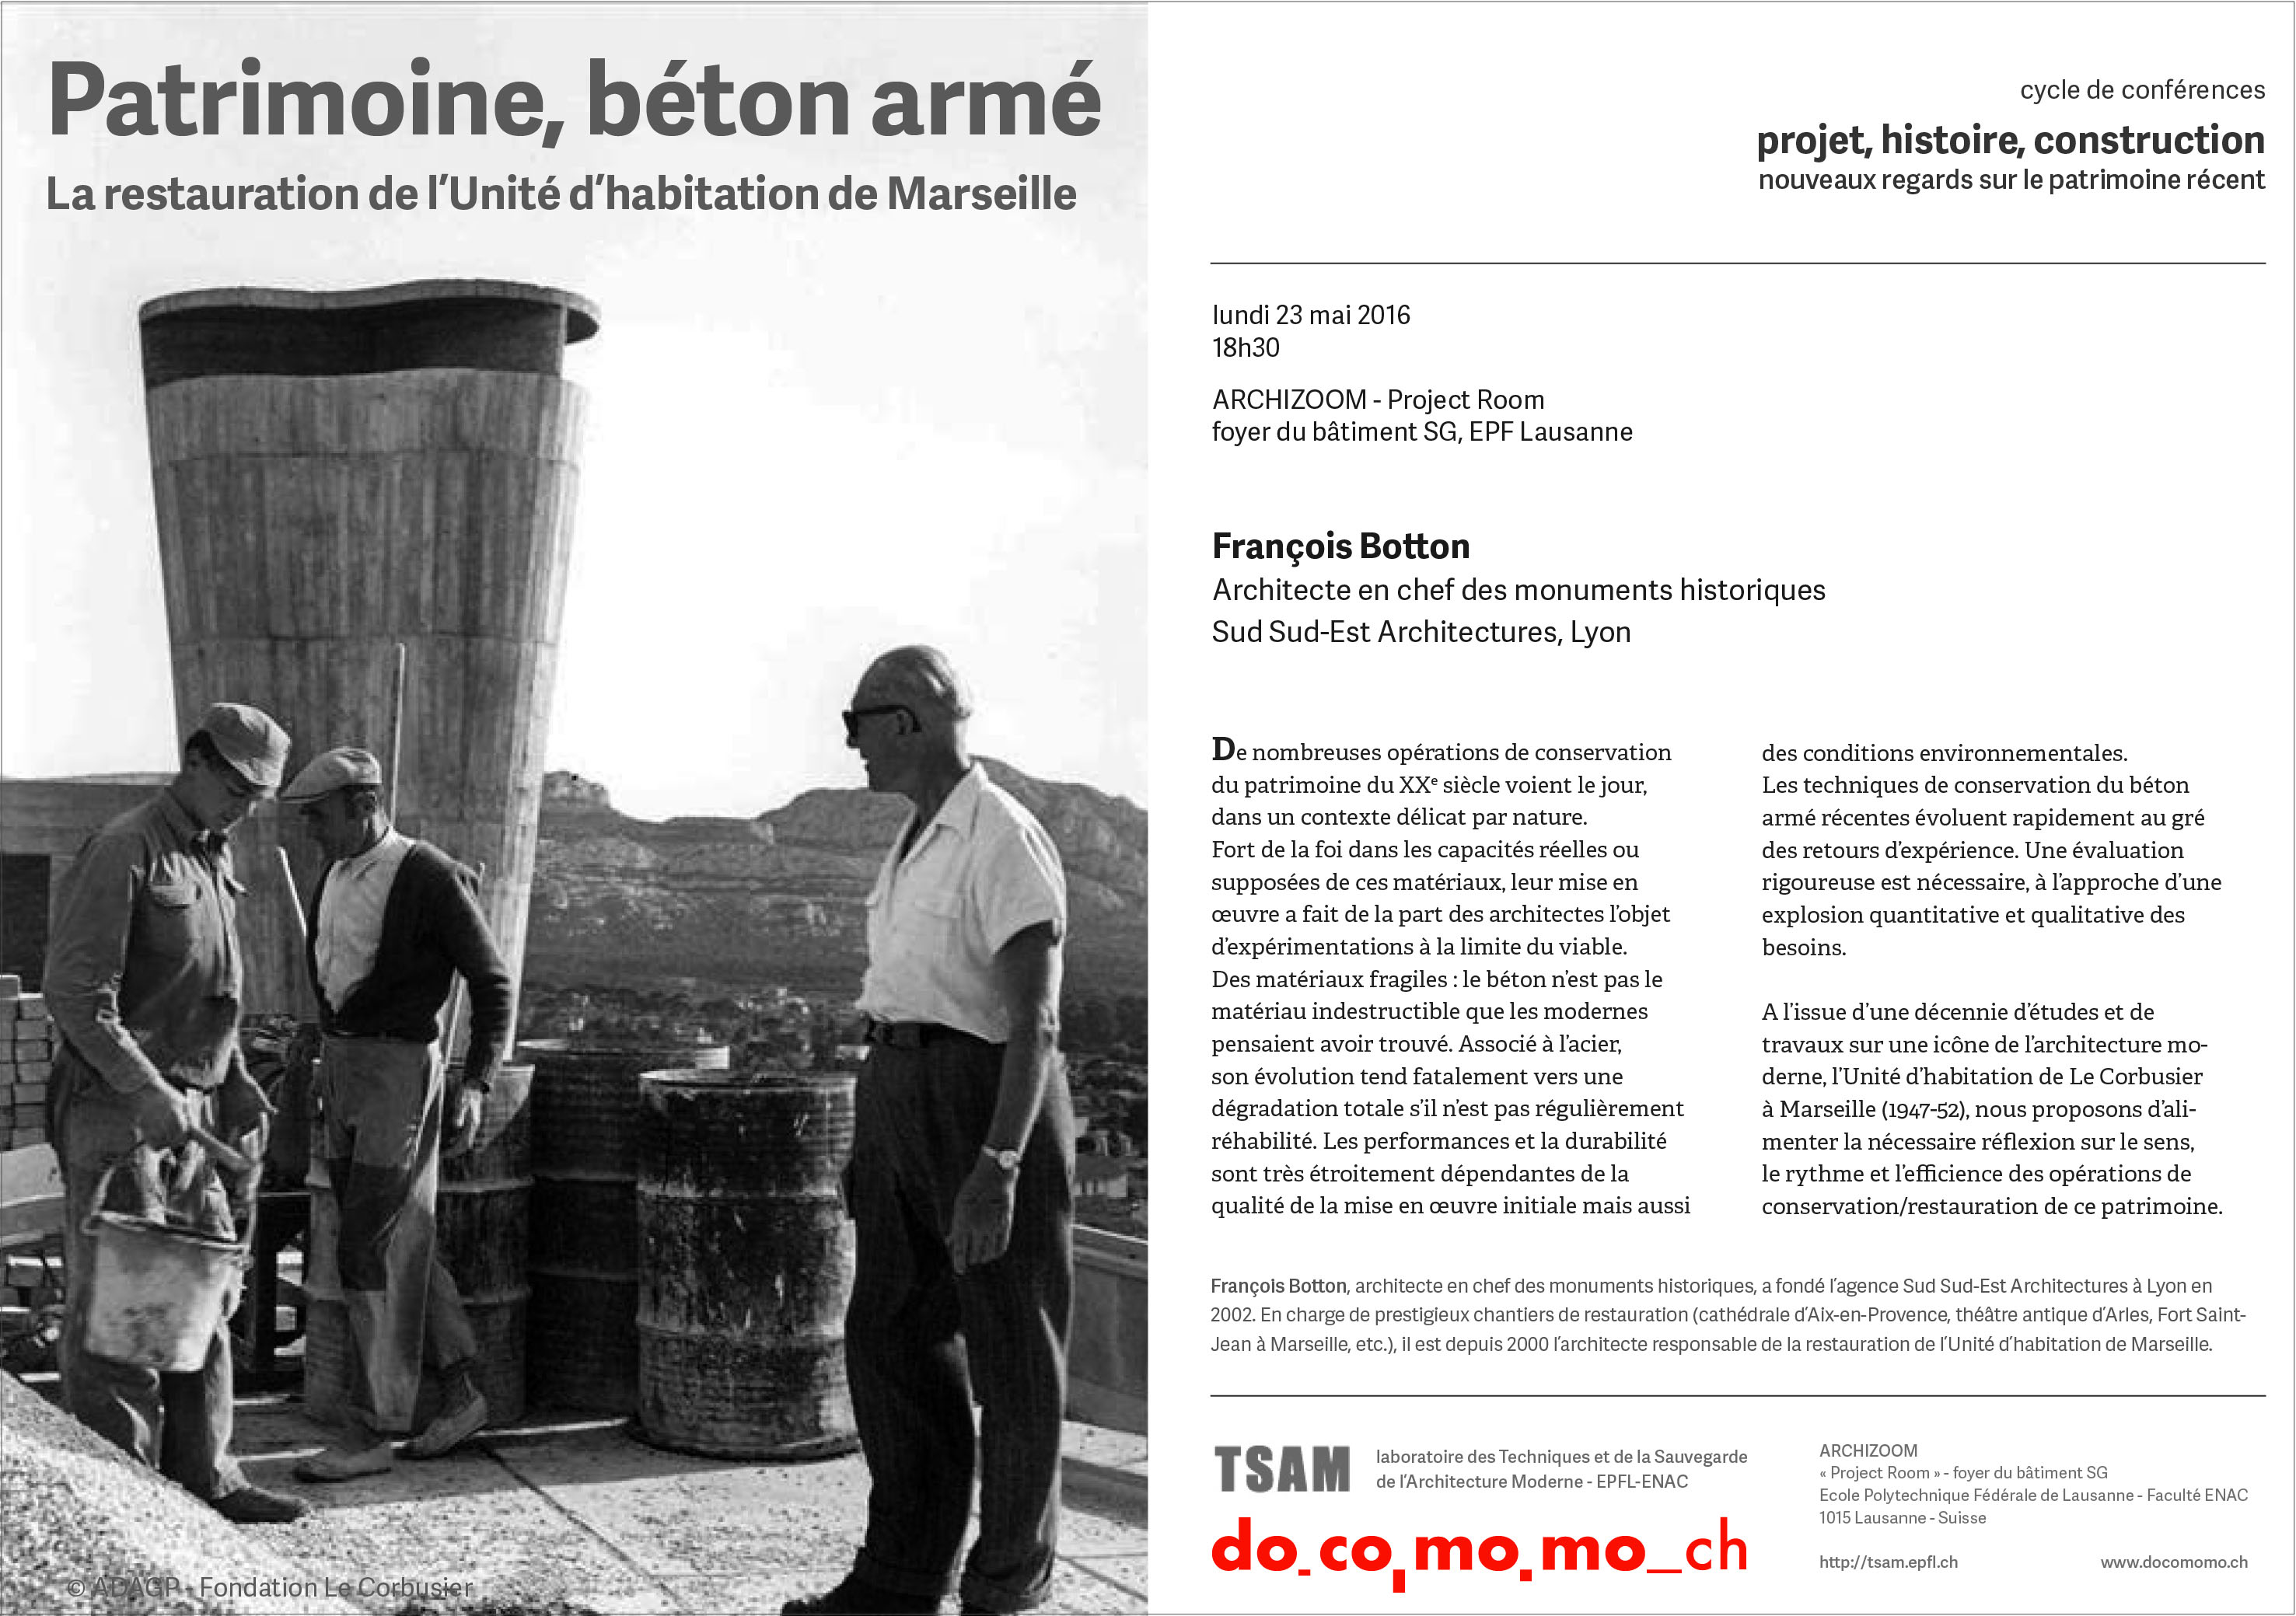 conférence tsam docomomo swizuerland unité habitation marseille françois botton restauration